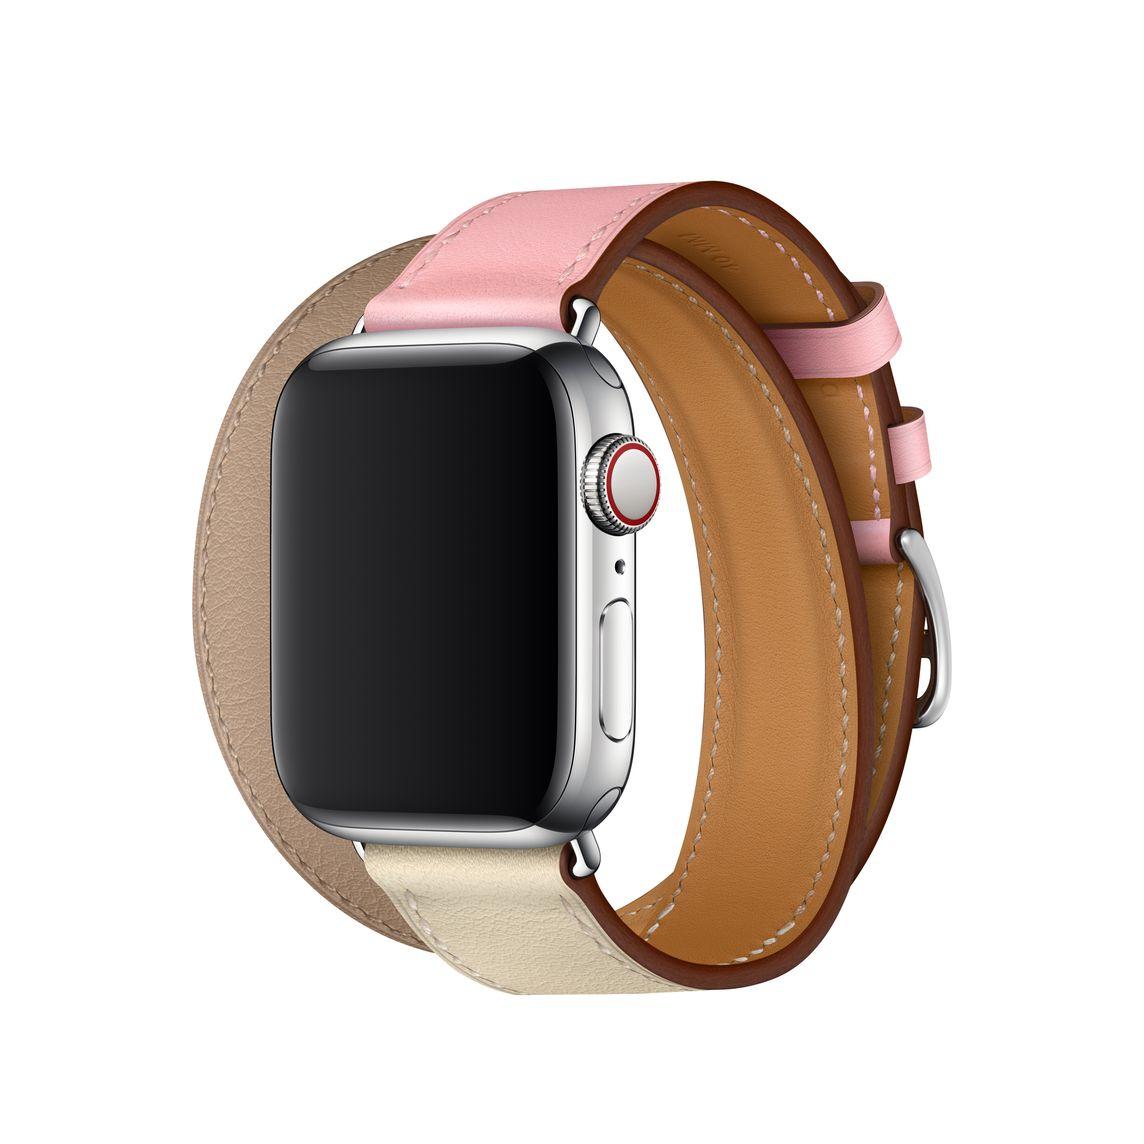 Apple Watch Hermès - 40mm Rose Sakura/Craie/Argile Swift Leather Double Tour